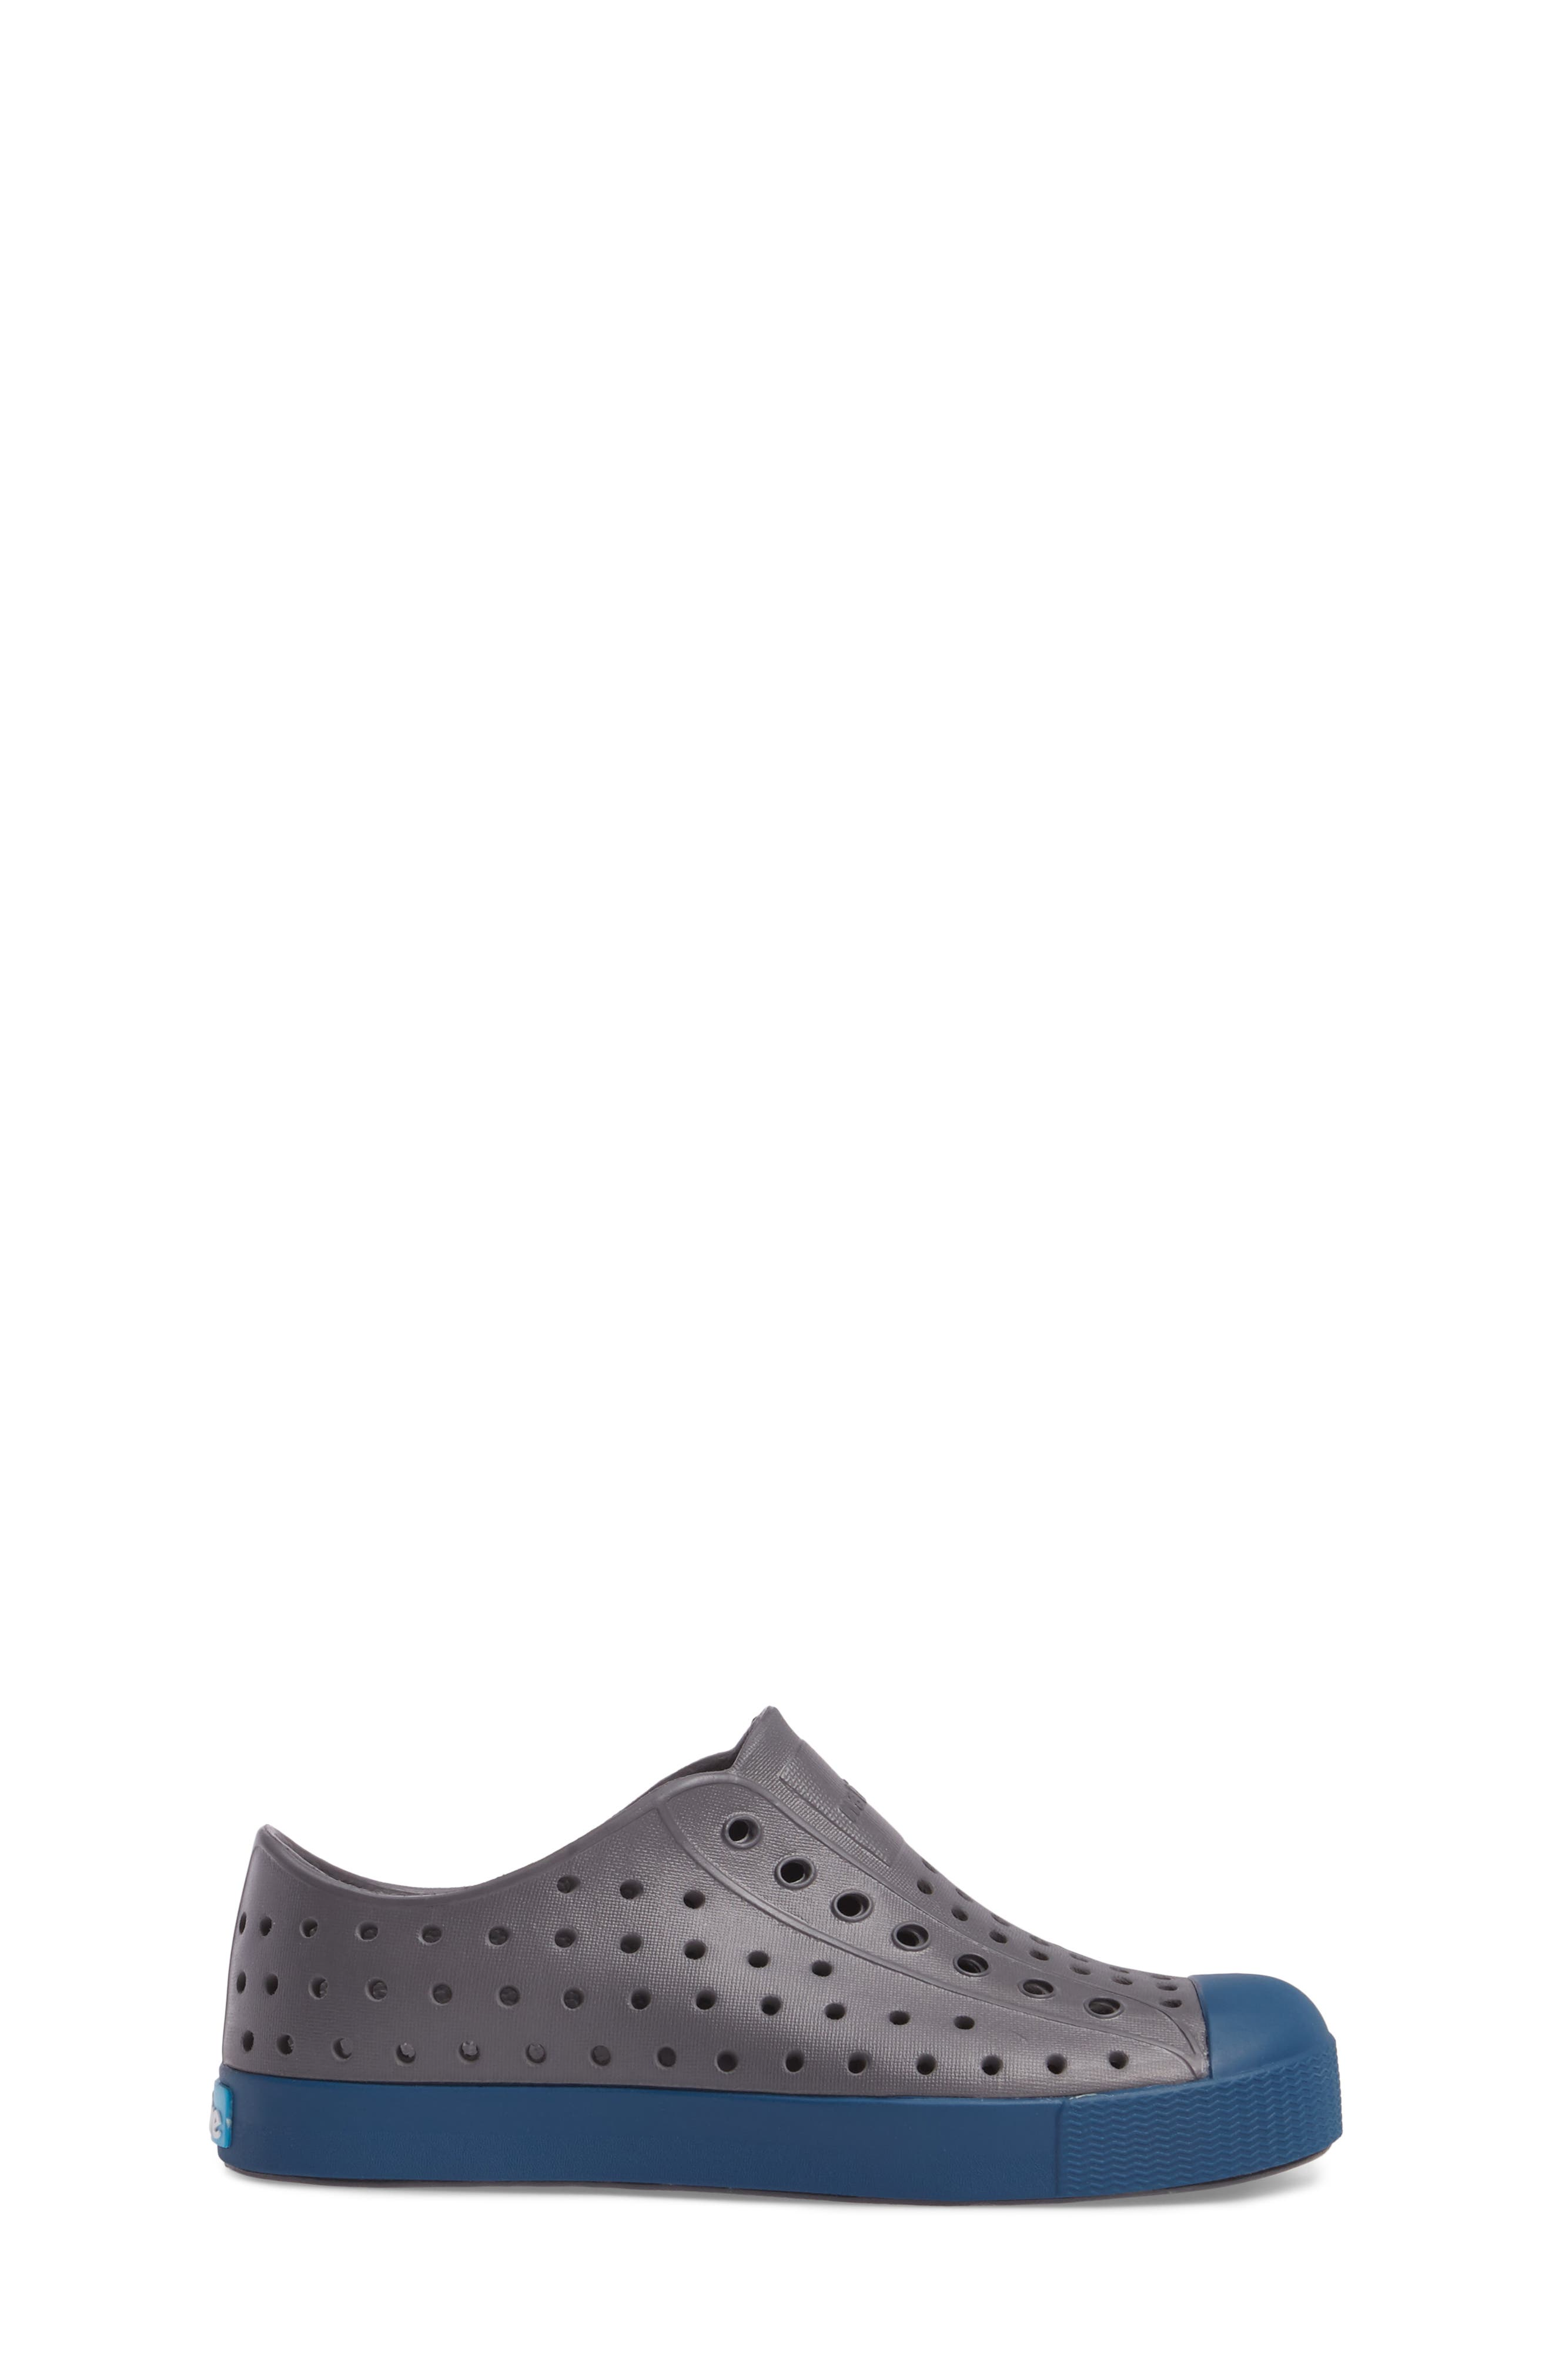 'Jefferson' Water Friendly Slip-On Sneaker,                             Alternate thumbnail 142, color,